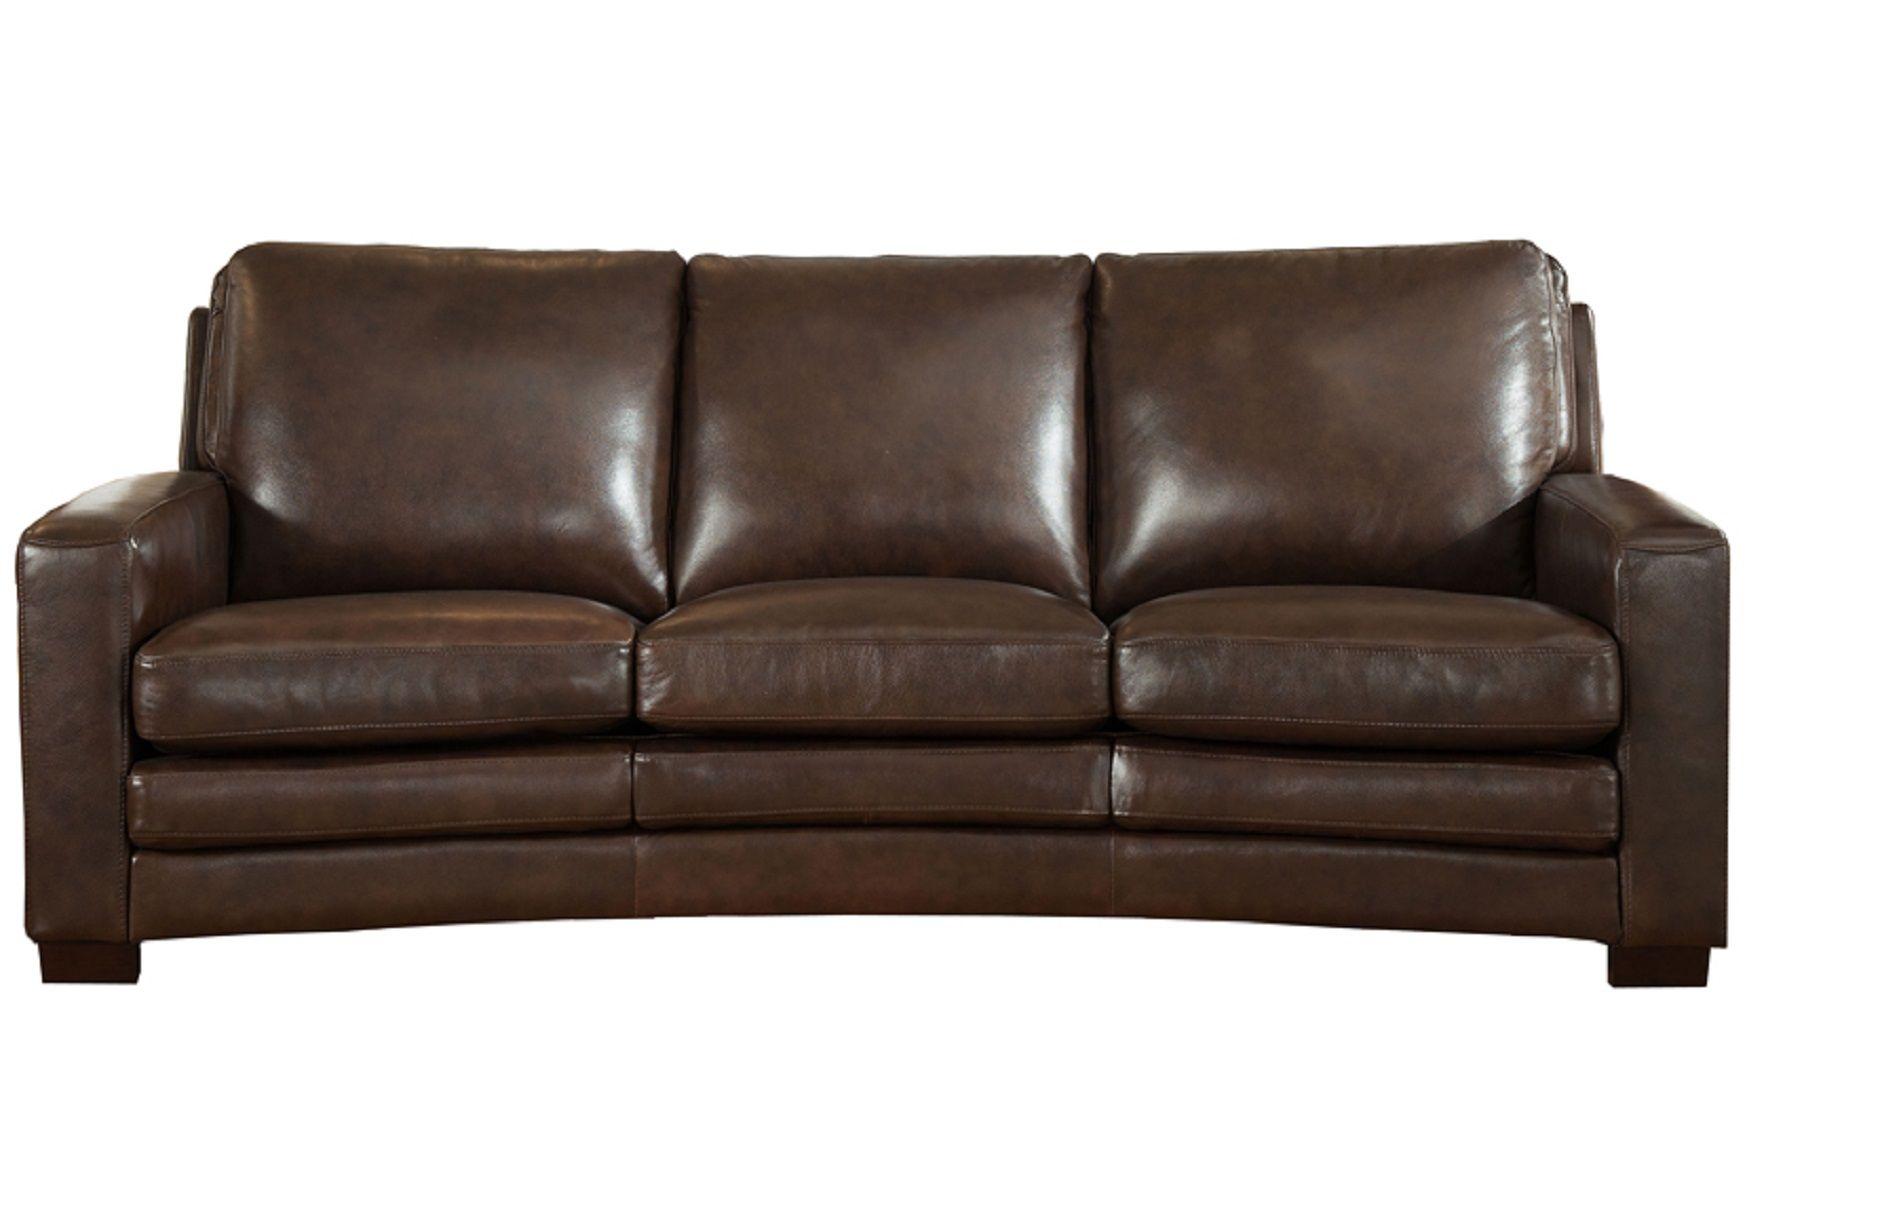 Joanna Full Top Grain Dark Brown Leather Sofa Brown Leather Sofa Dark Brown Leather Sofa Modern Leather Sofa